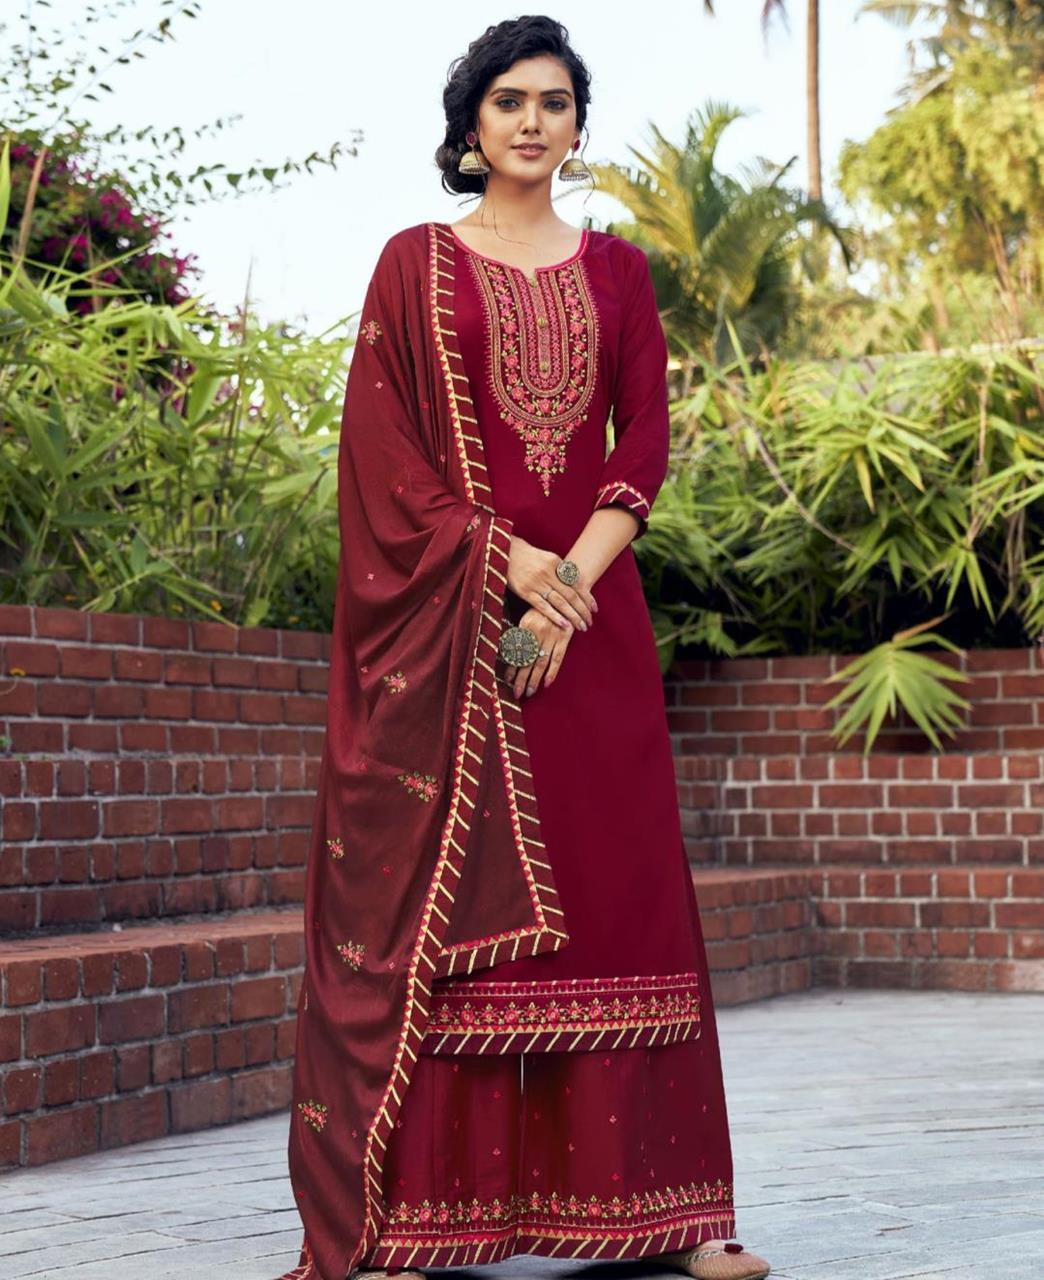 Embroidered Cotton Straight cut Salwar Kameez in Maroon